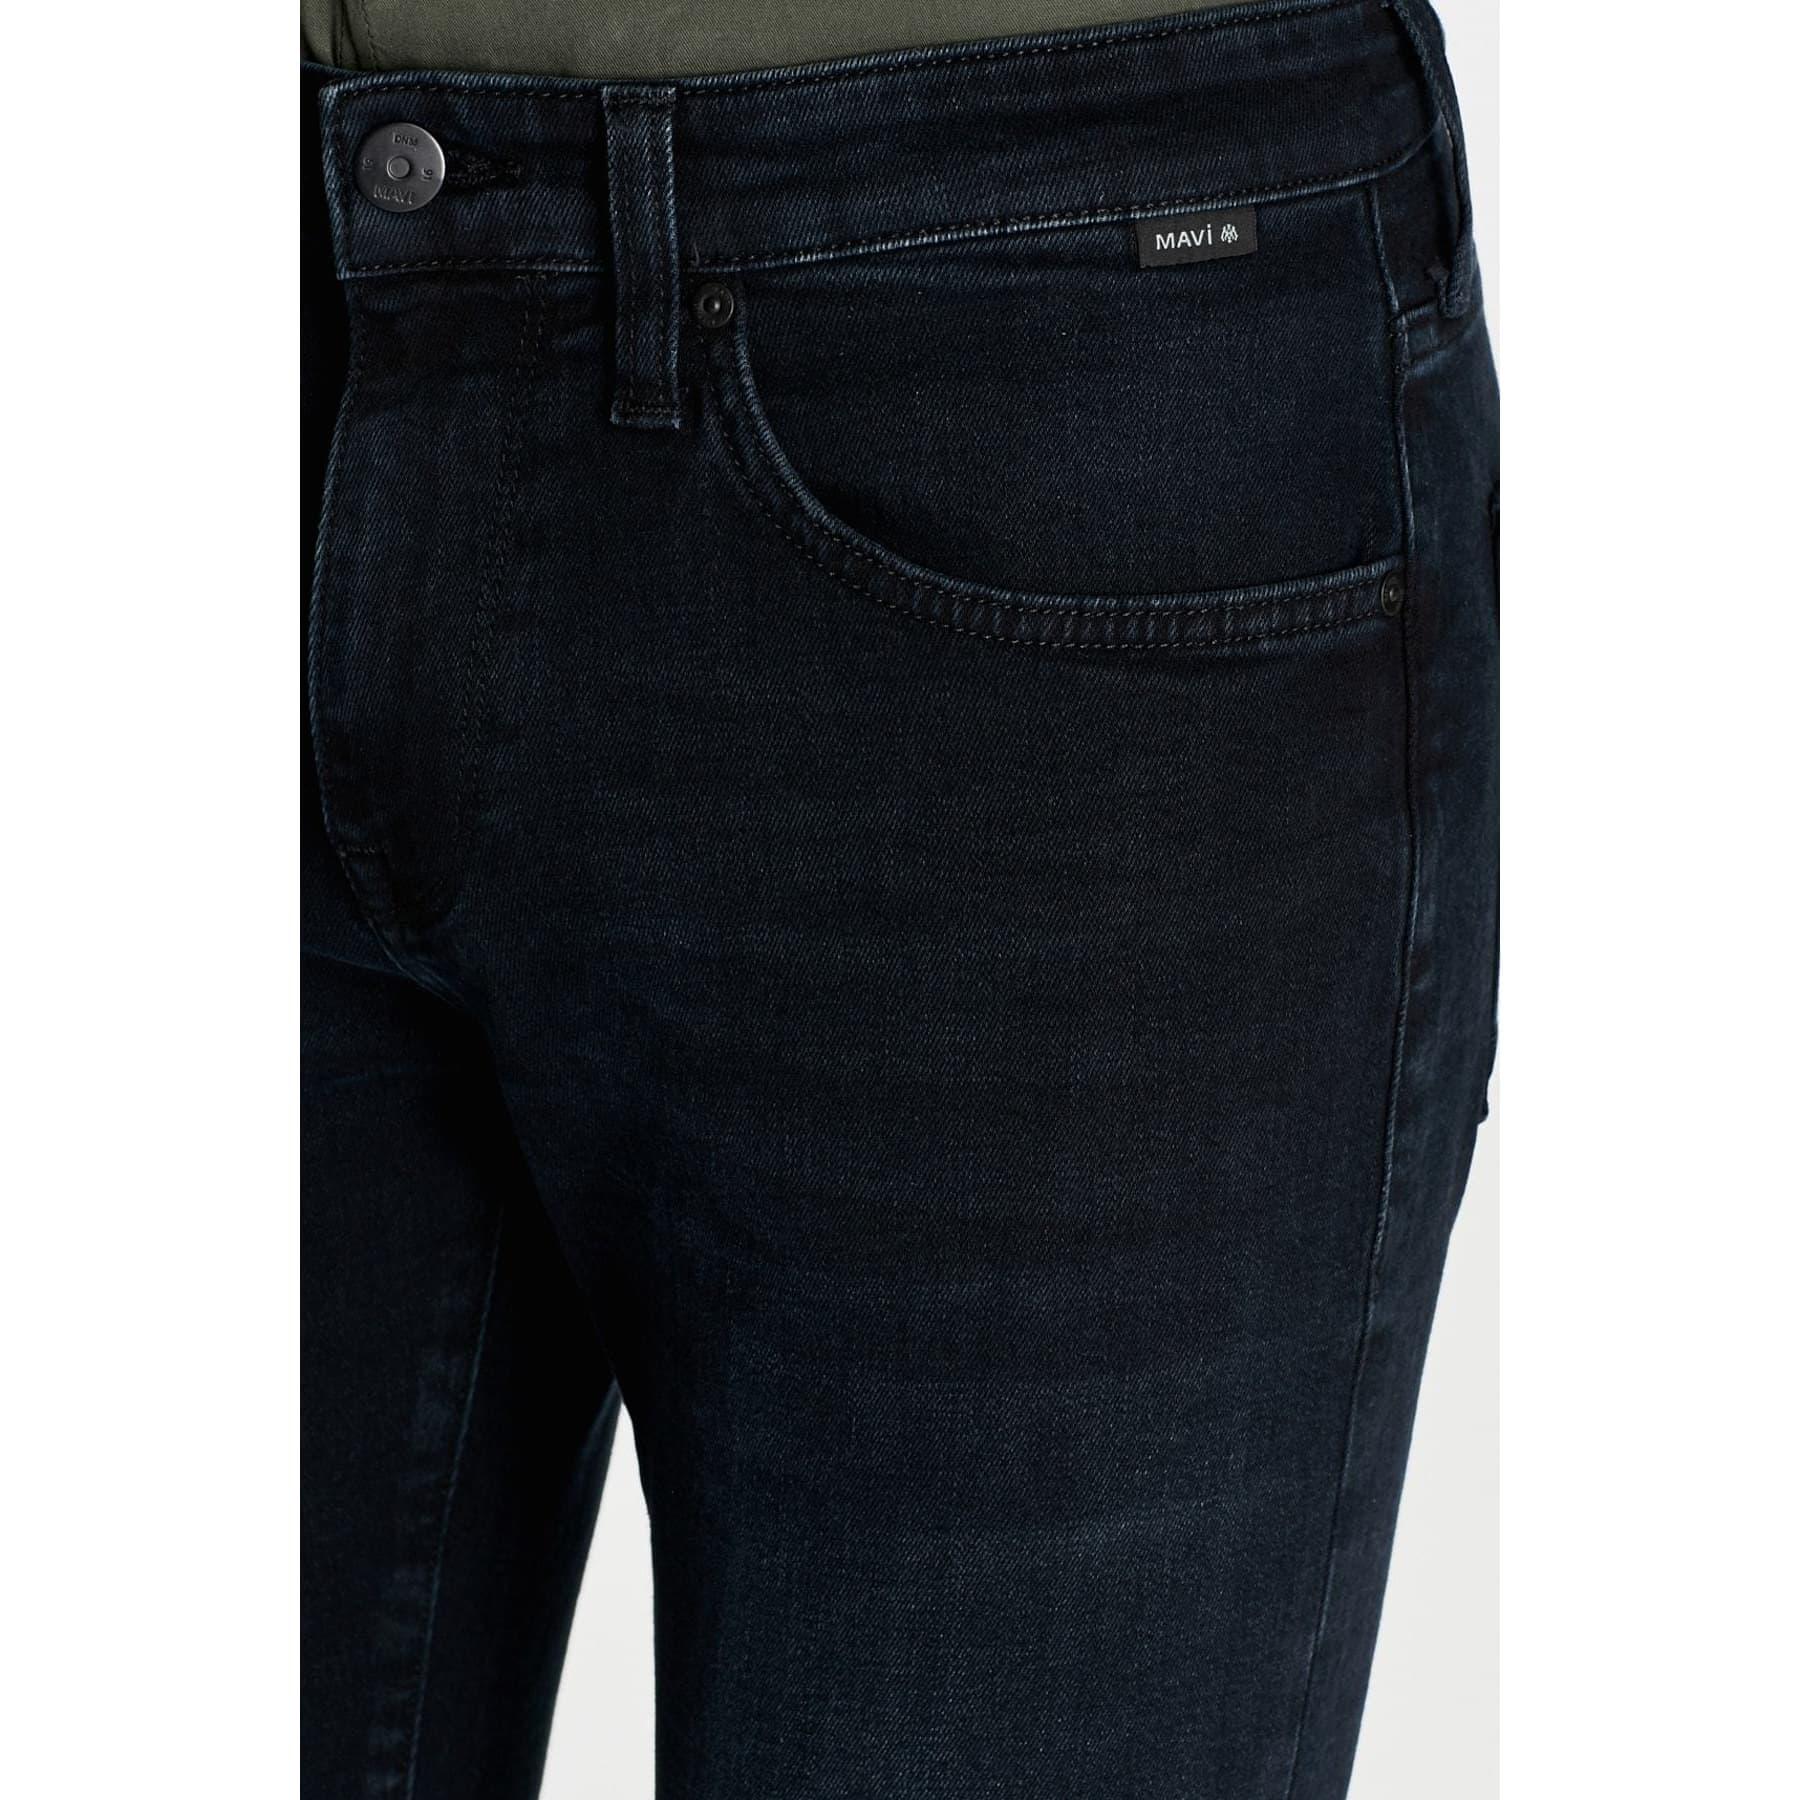 Marcus Mavi Black Erkek Jean Pantolon